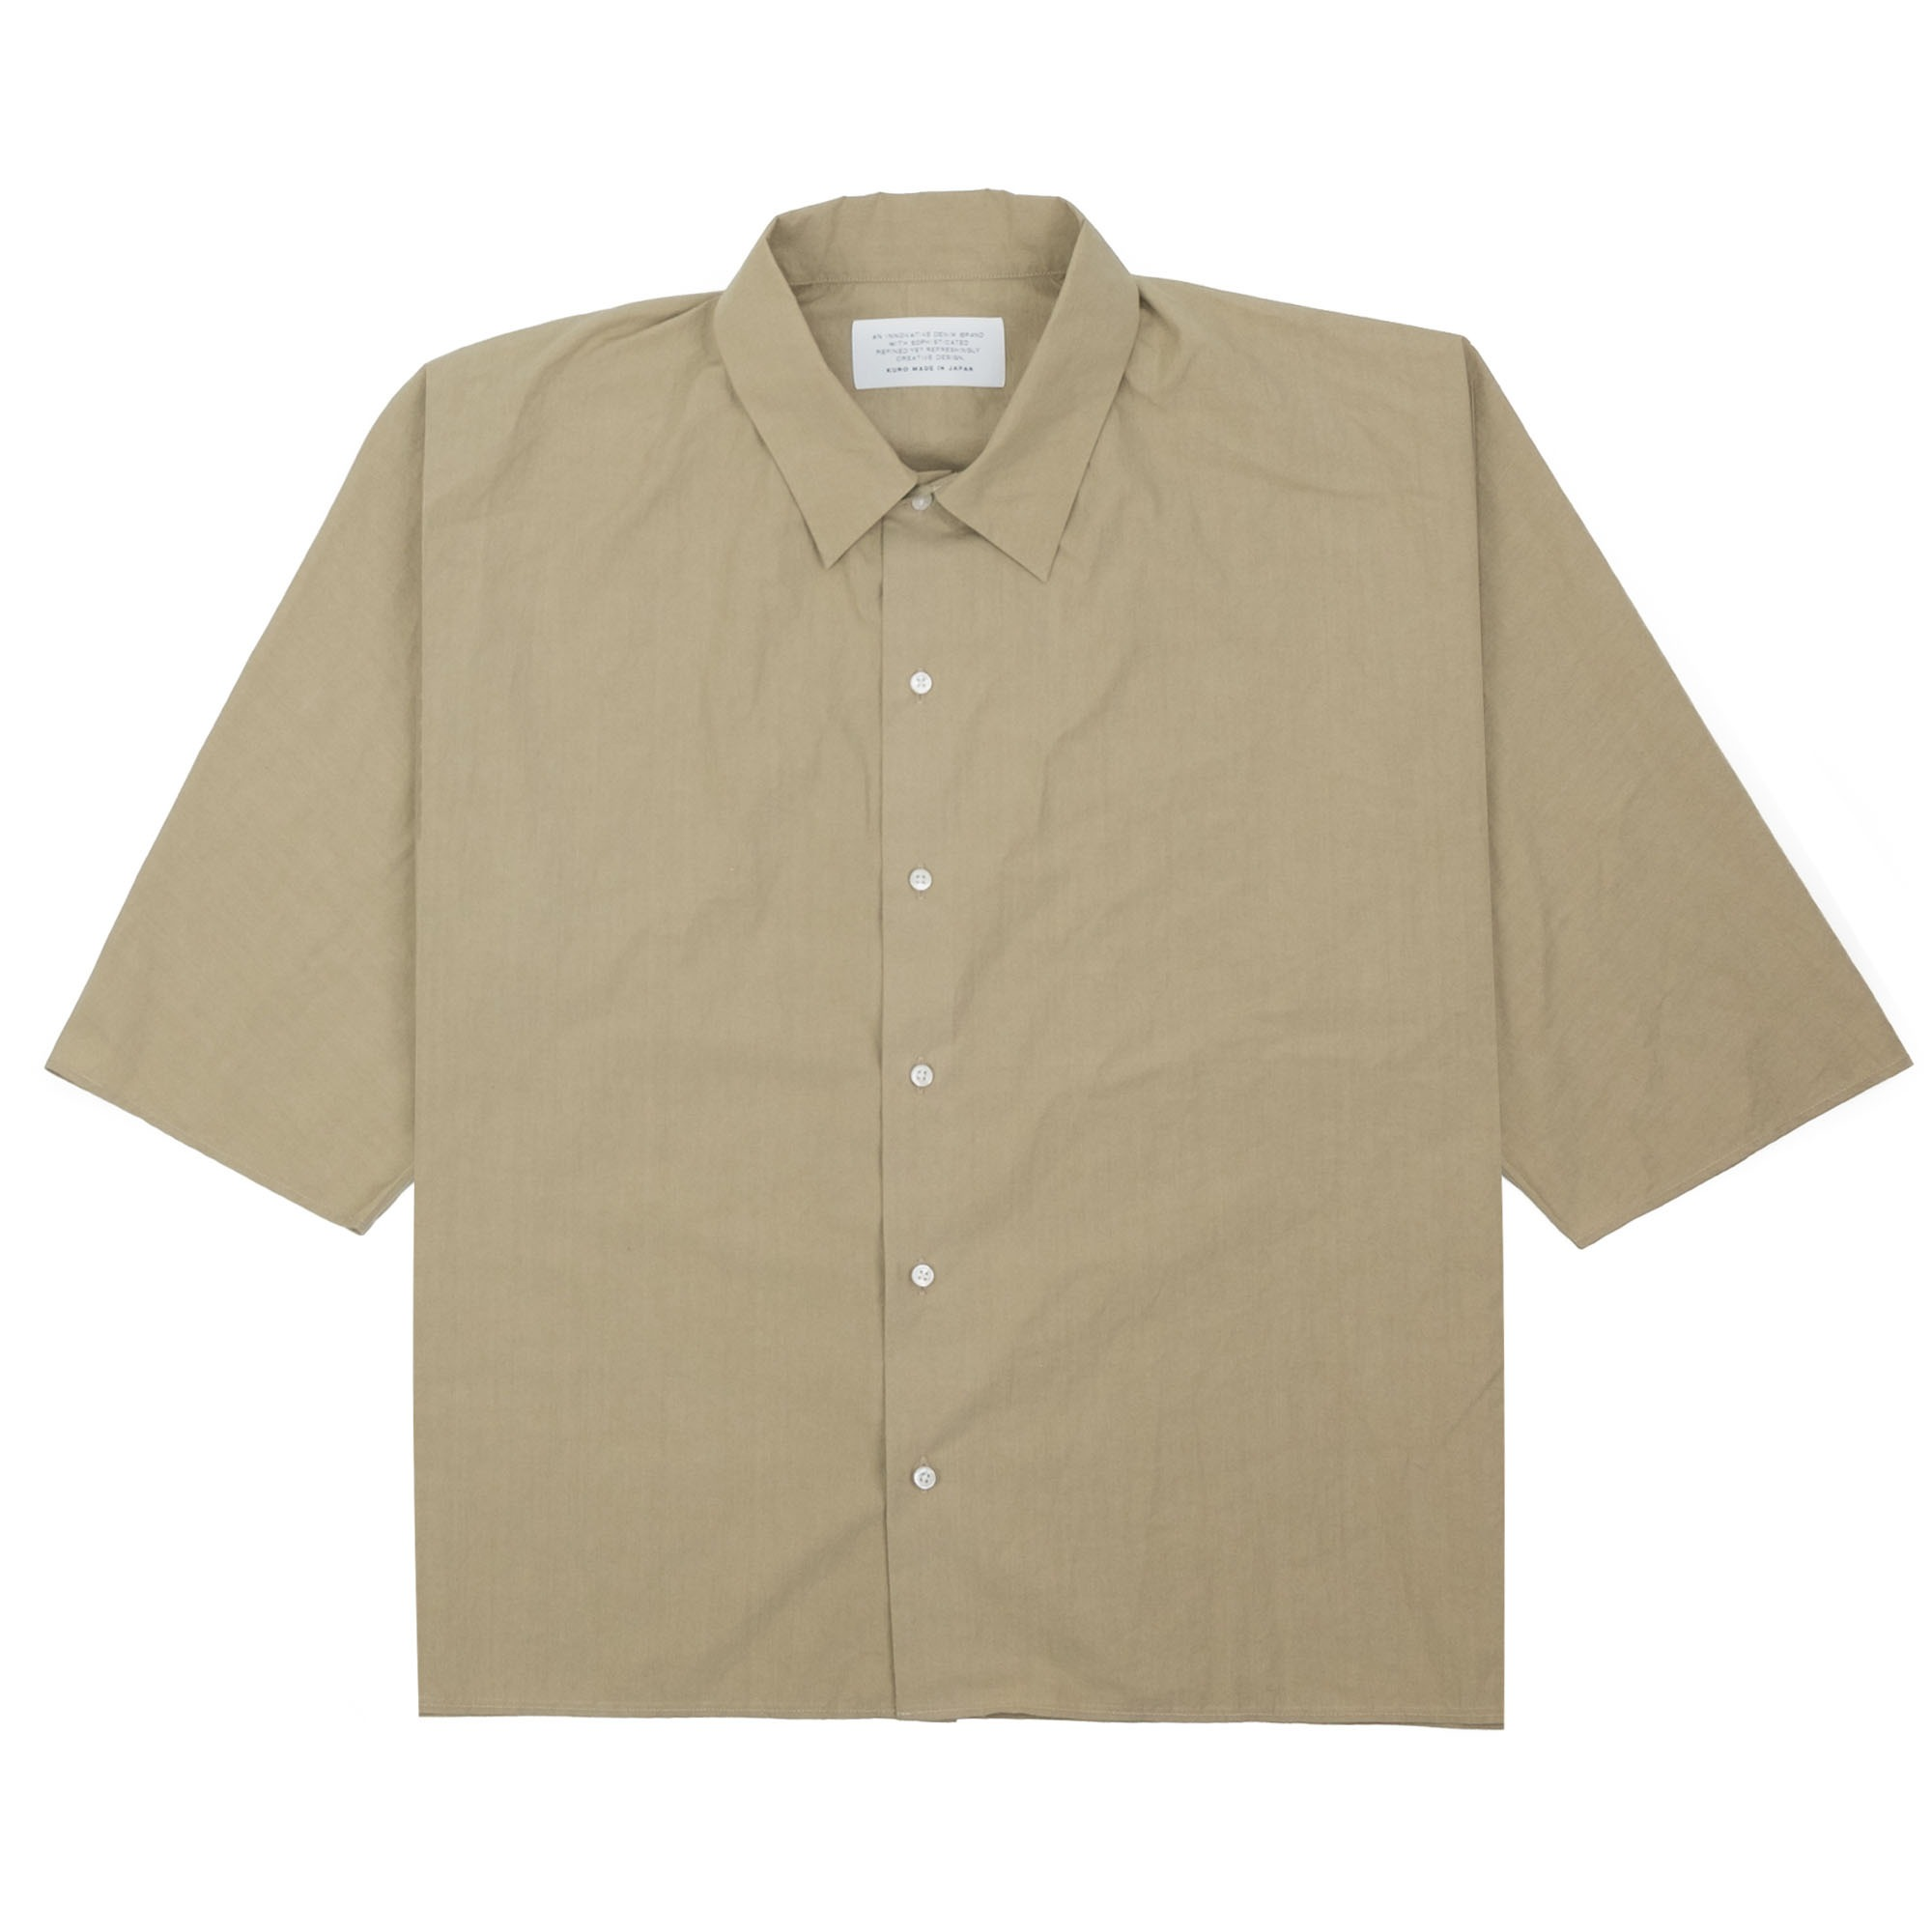 Kuro Dolman Sleeve S/S Shirt - Beige